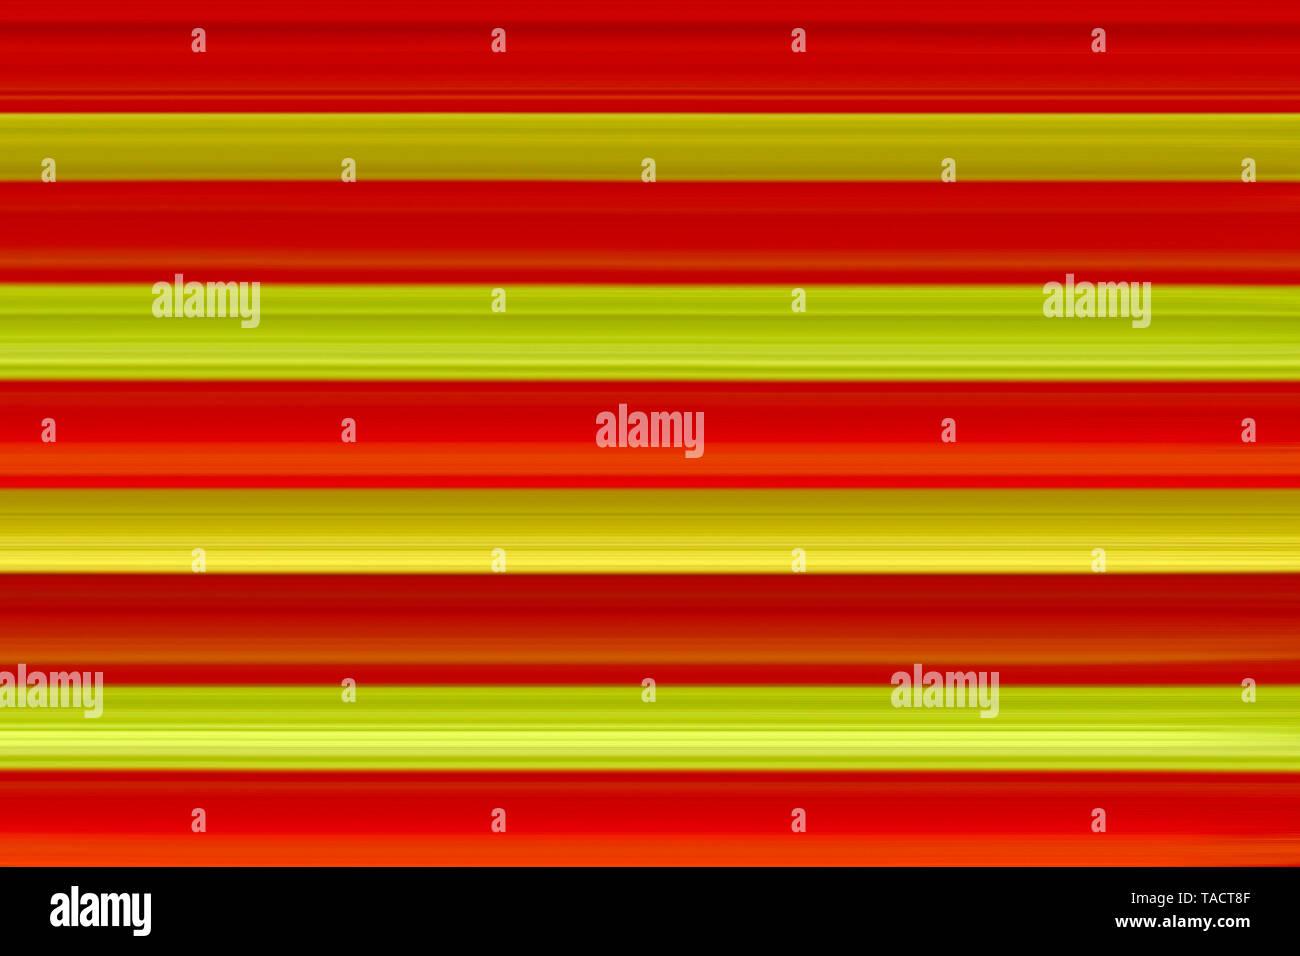 Modern fine art computer digital paintings creative hypnotist imagination colourful line - Stock Image